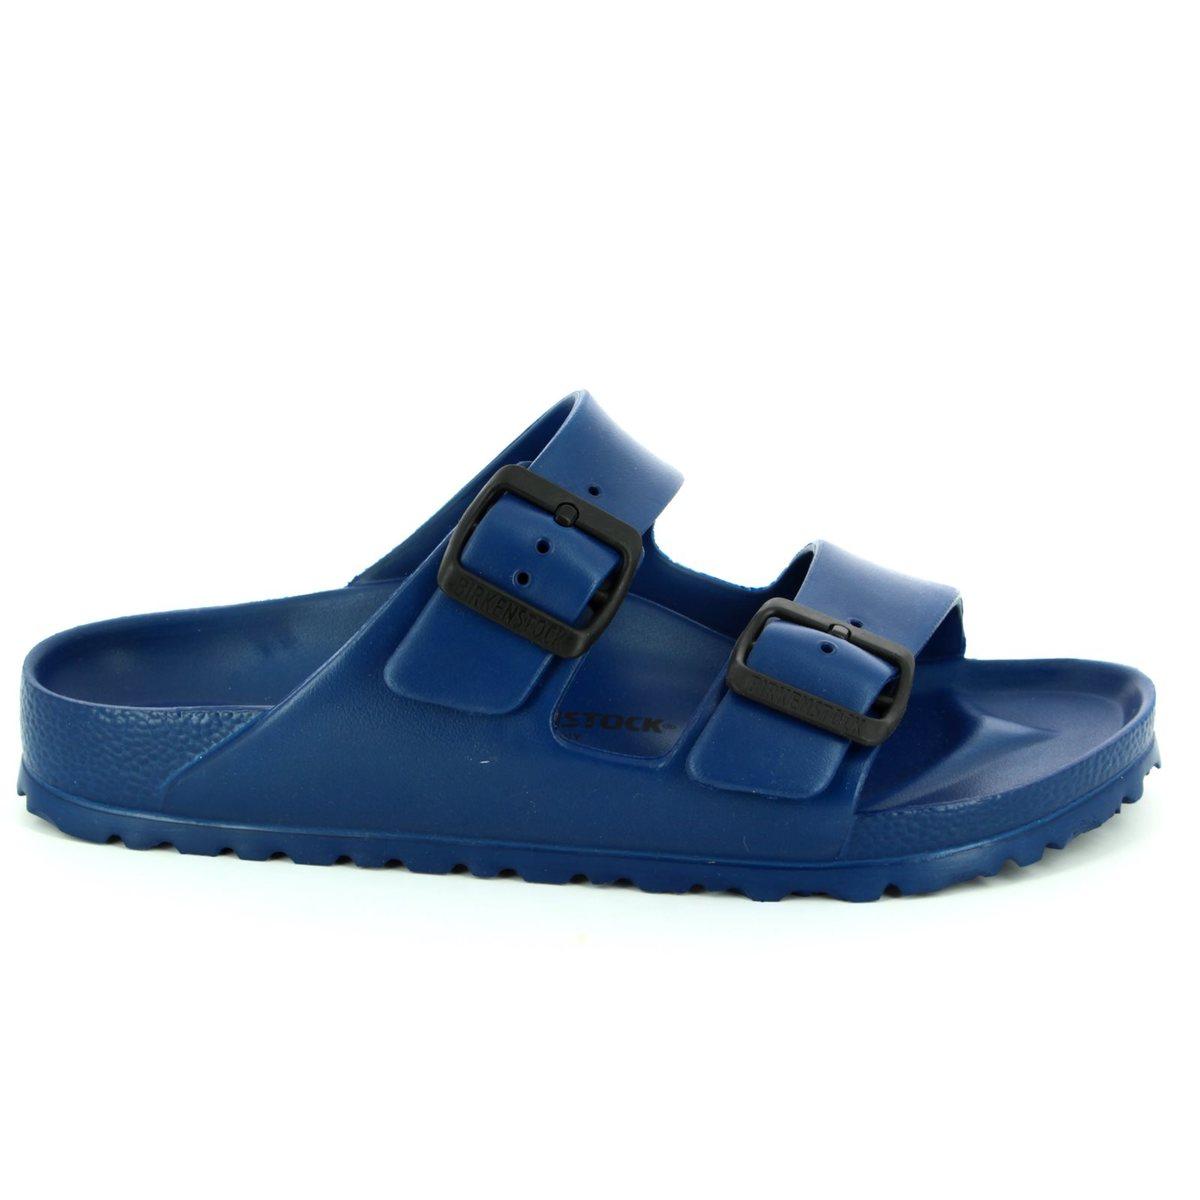 6eb7095a133 Birkenstock Arizona Eva Narrow Fit Ladies 129433 Navy sandals